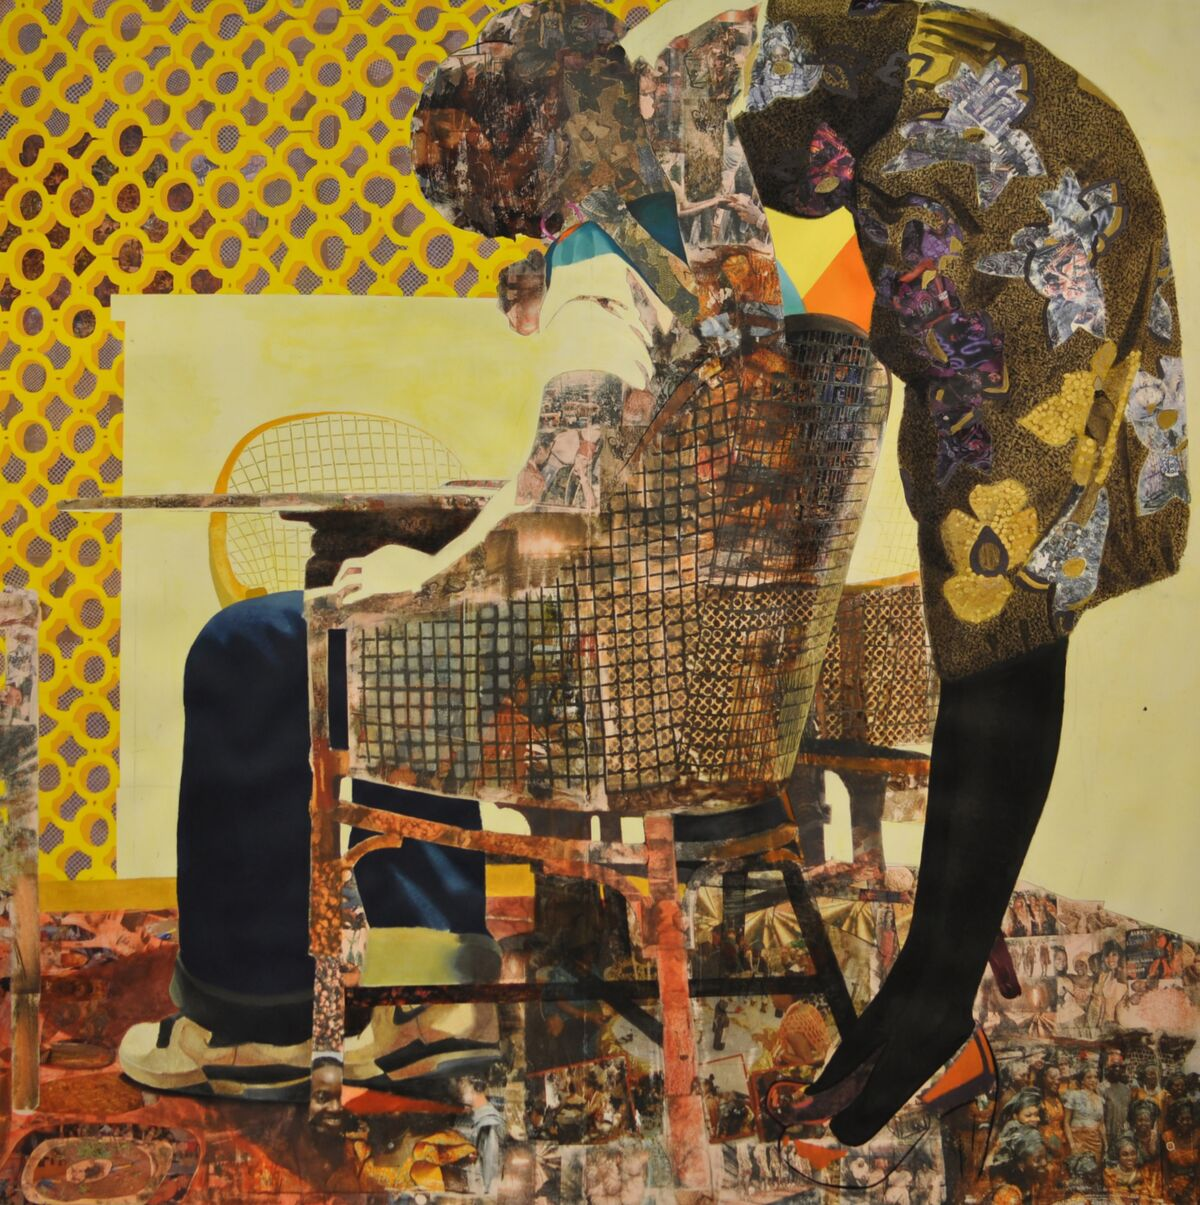 Njideka Akunyili Crosby, Nyado: The Thing Around Her Neck, 2011. © Njideka Akunyili Crosby. Courtesy of the artists, Victoria Miro, London/Venice, and David Zwirner.